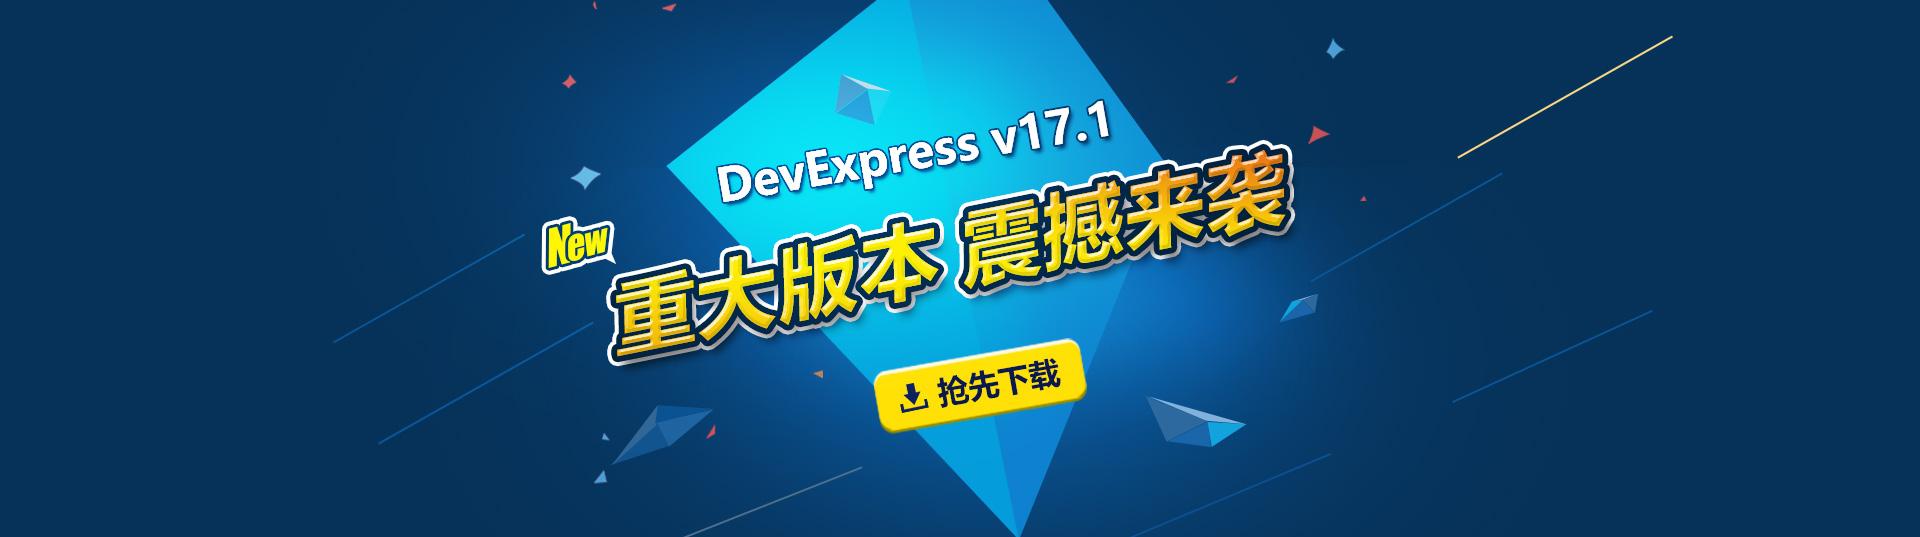 DevExpress v17.1.3全新发布